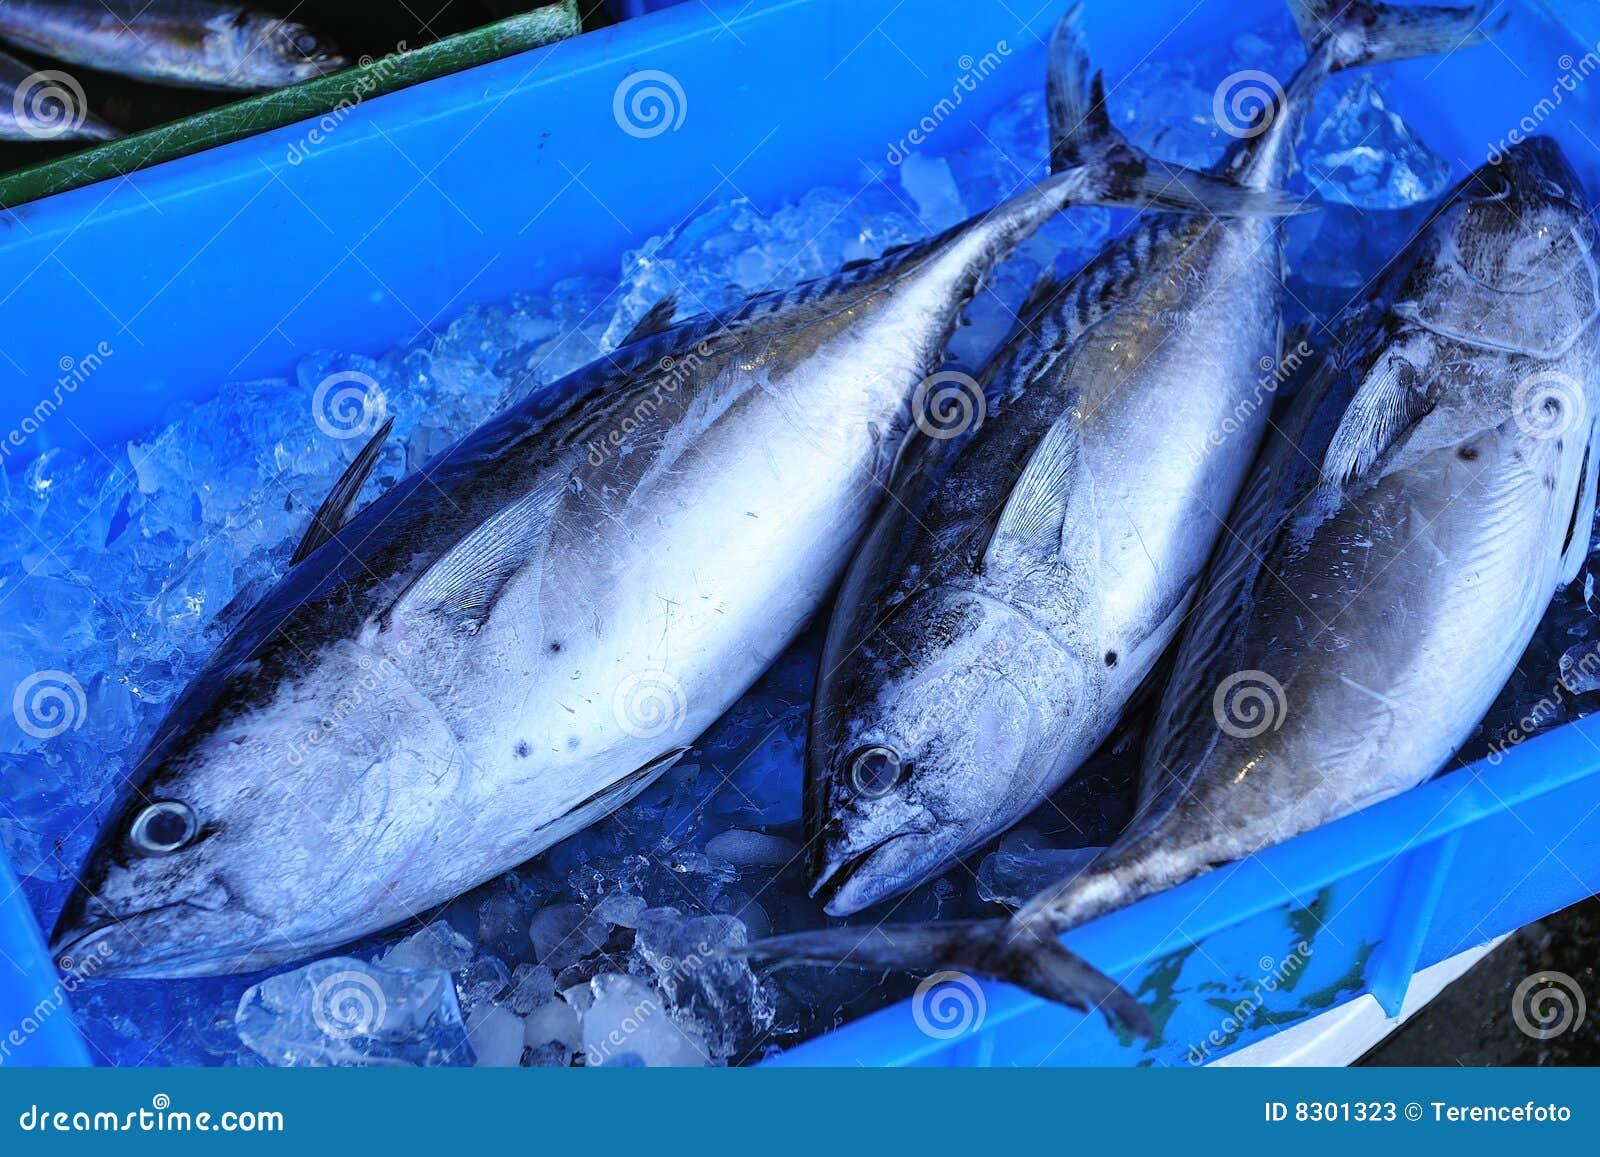 how to prepare fresh tuna